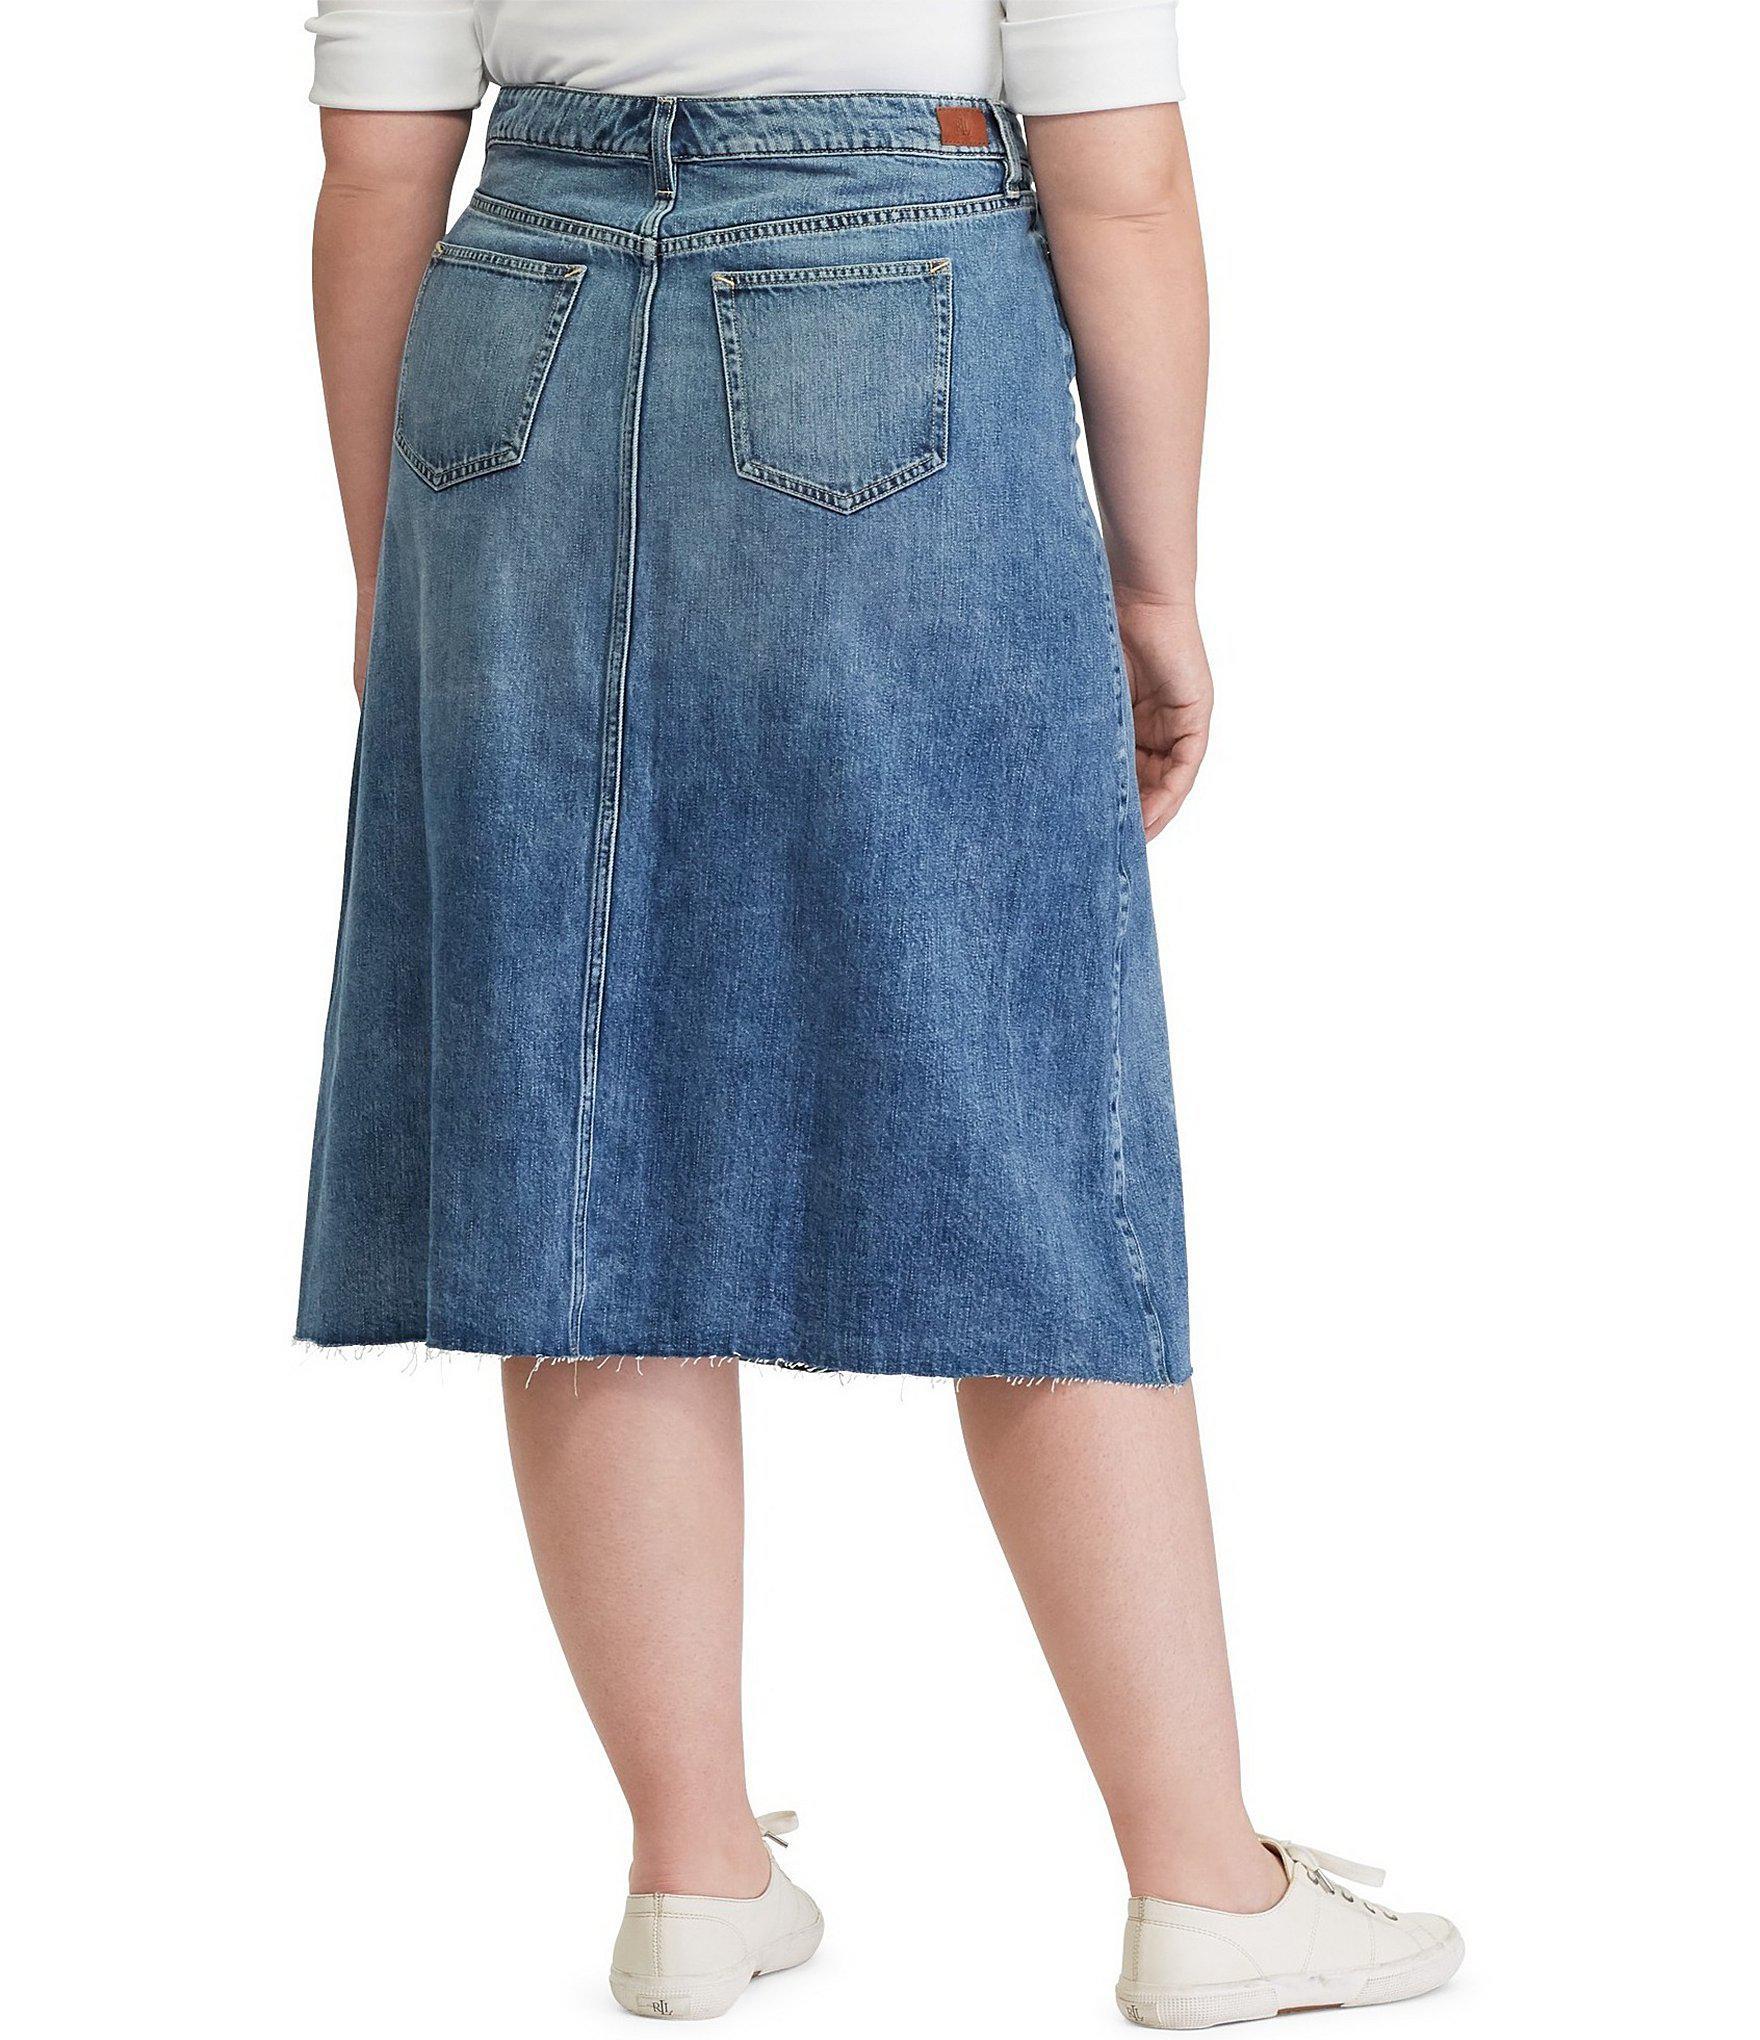 38a0dadc003 Dillards Plus Size Black Skirts - Data Dynamic AG